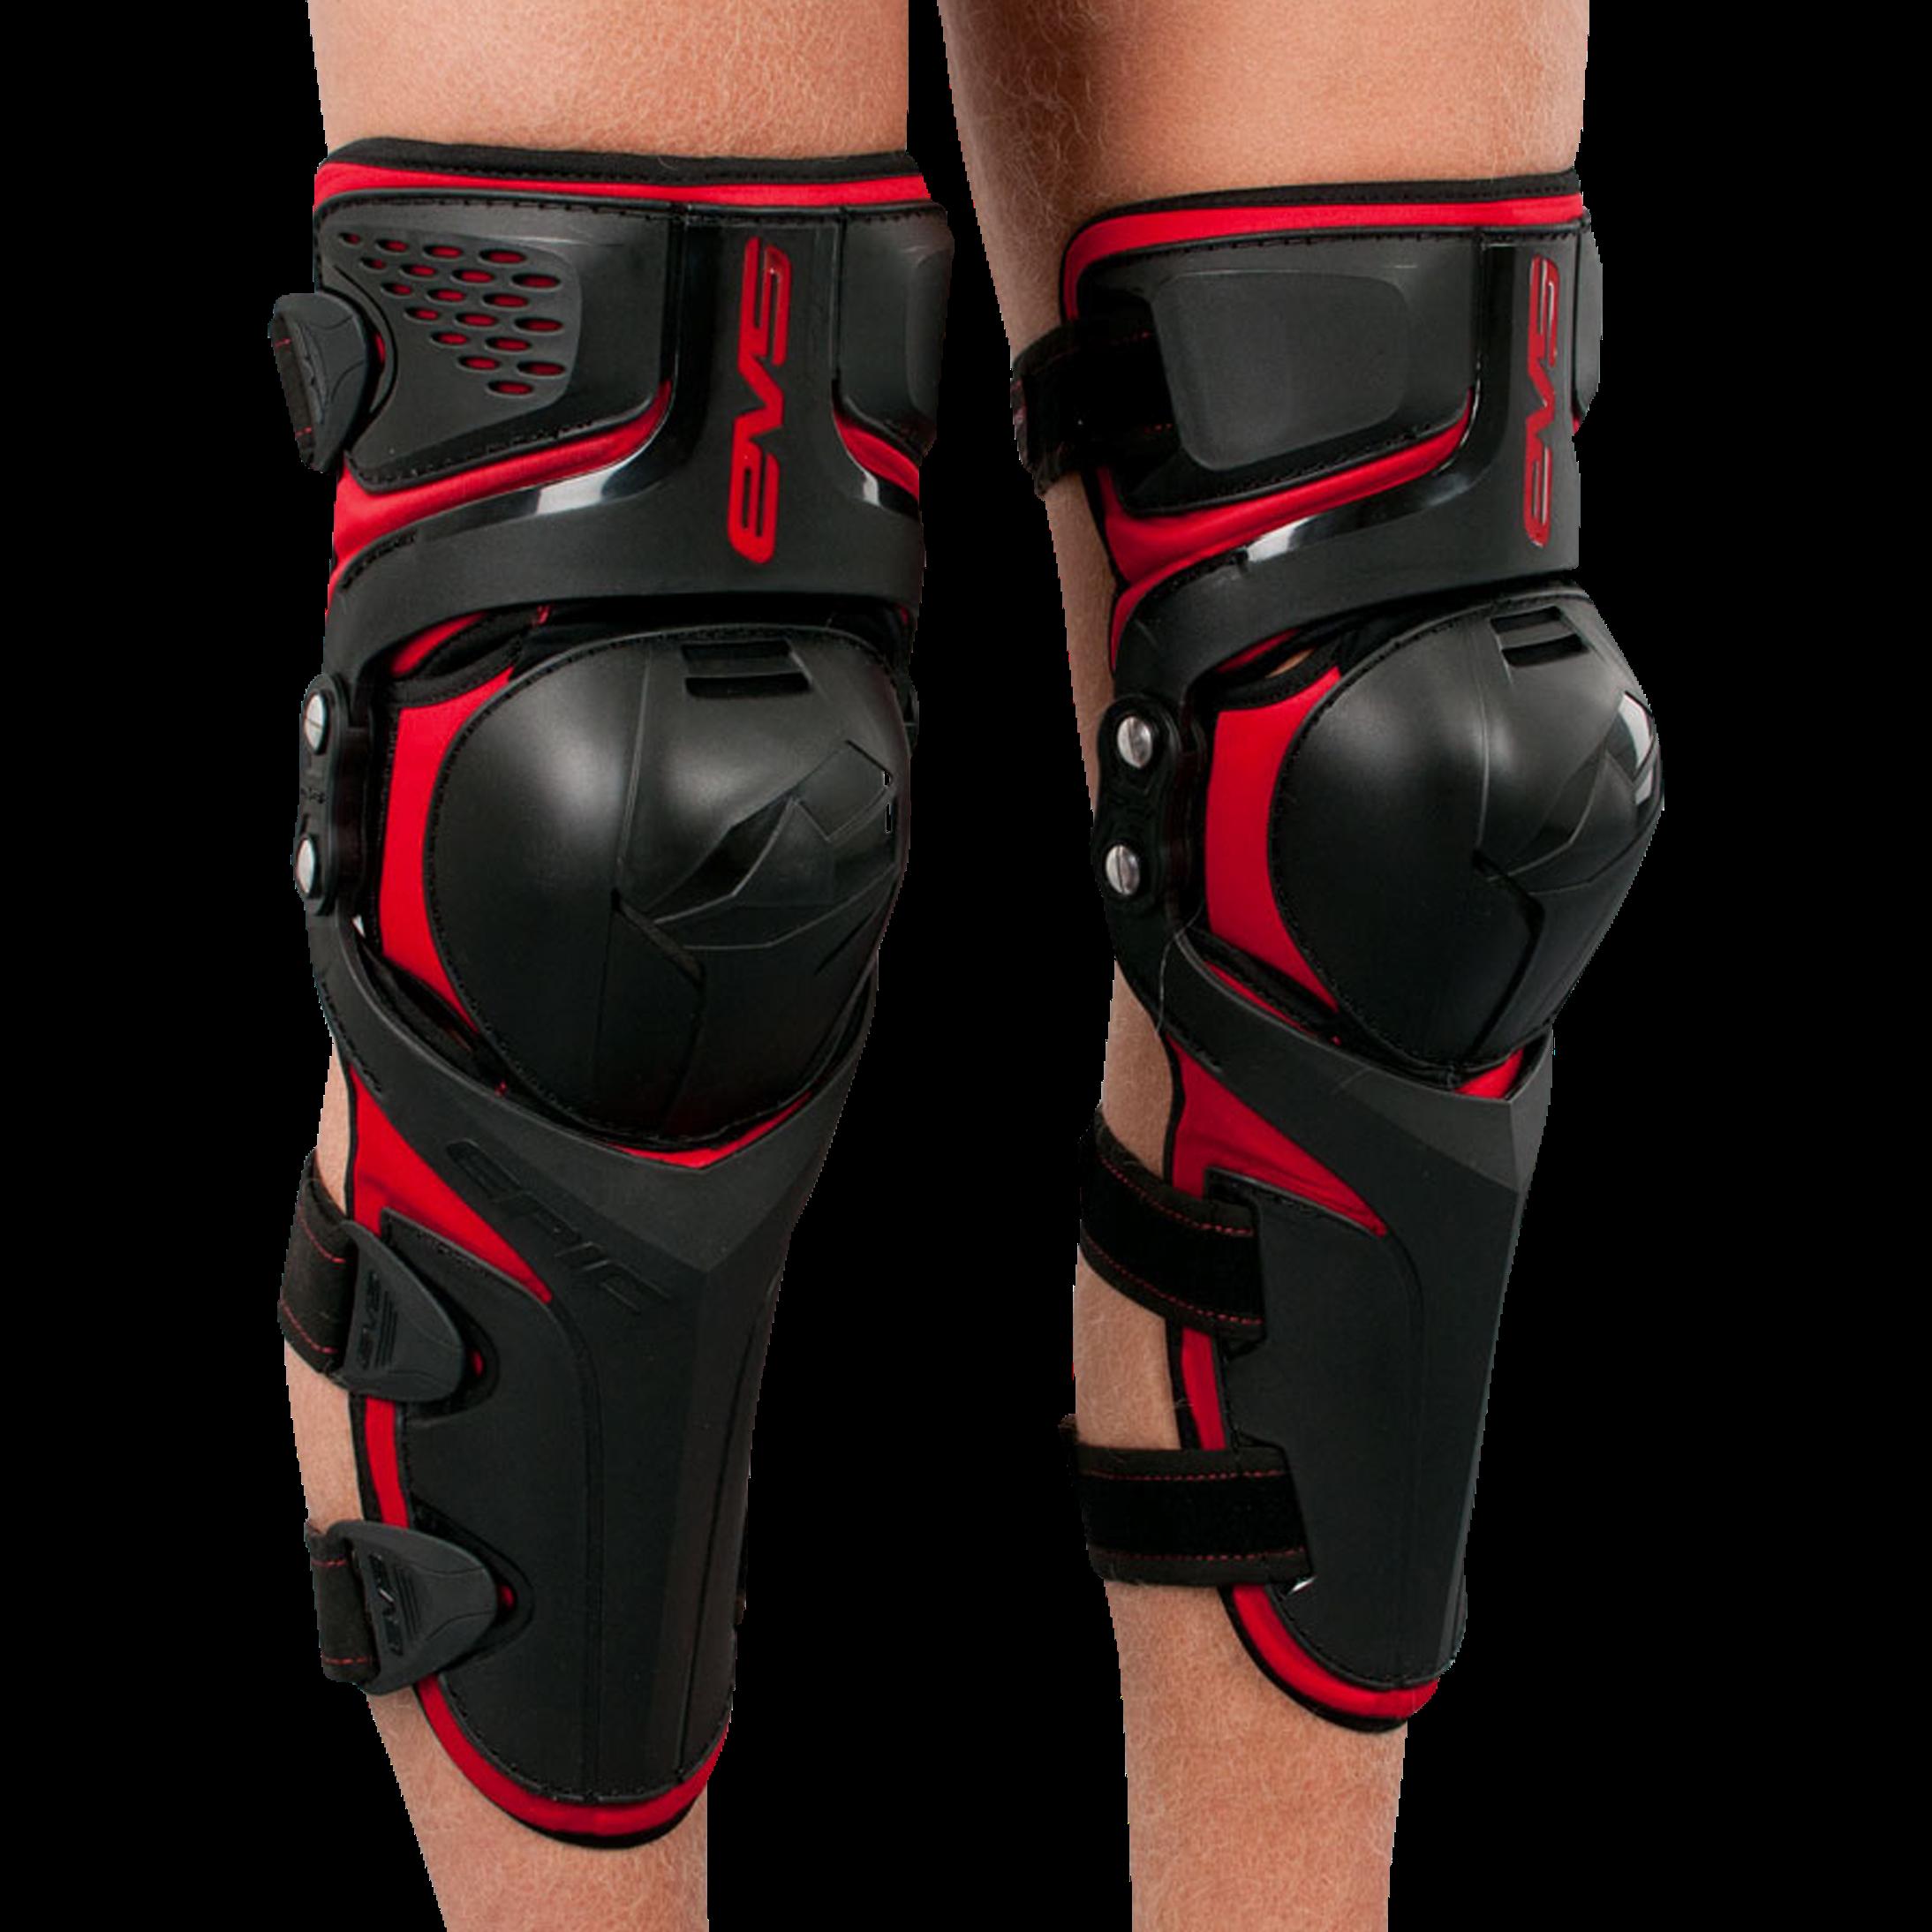 EVS Epic Knee Pad